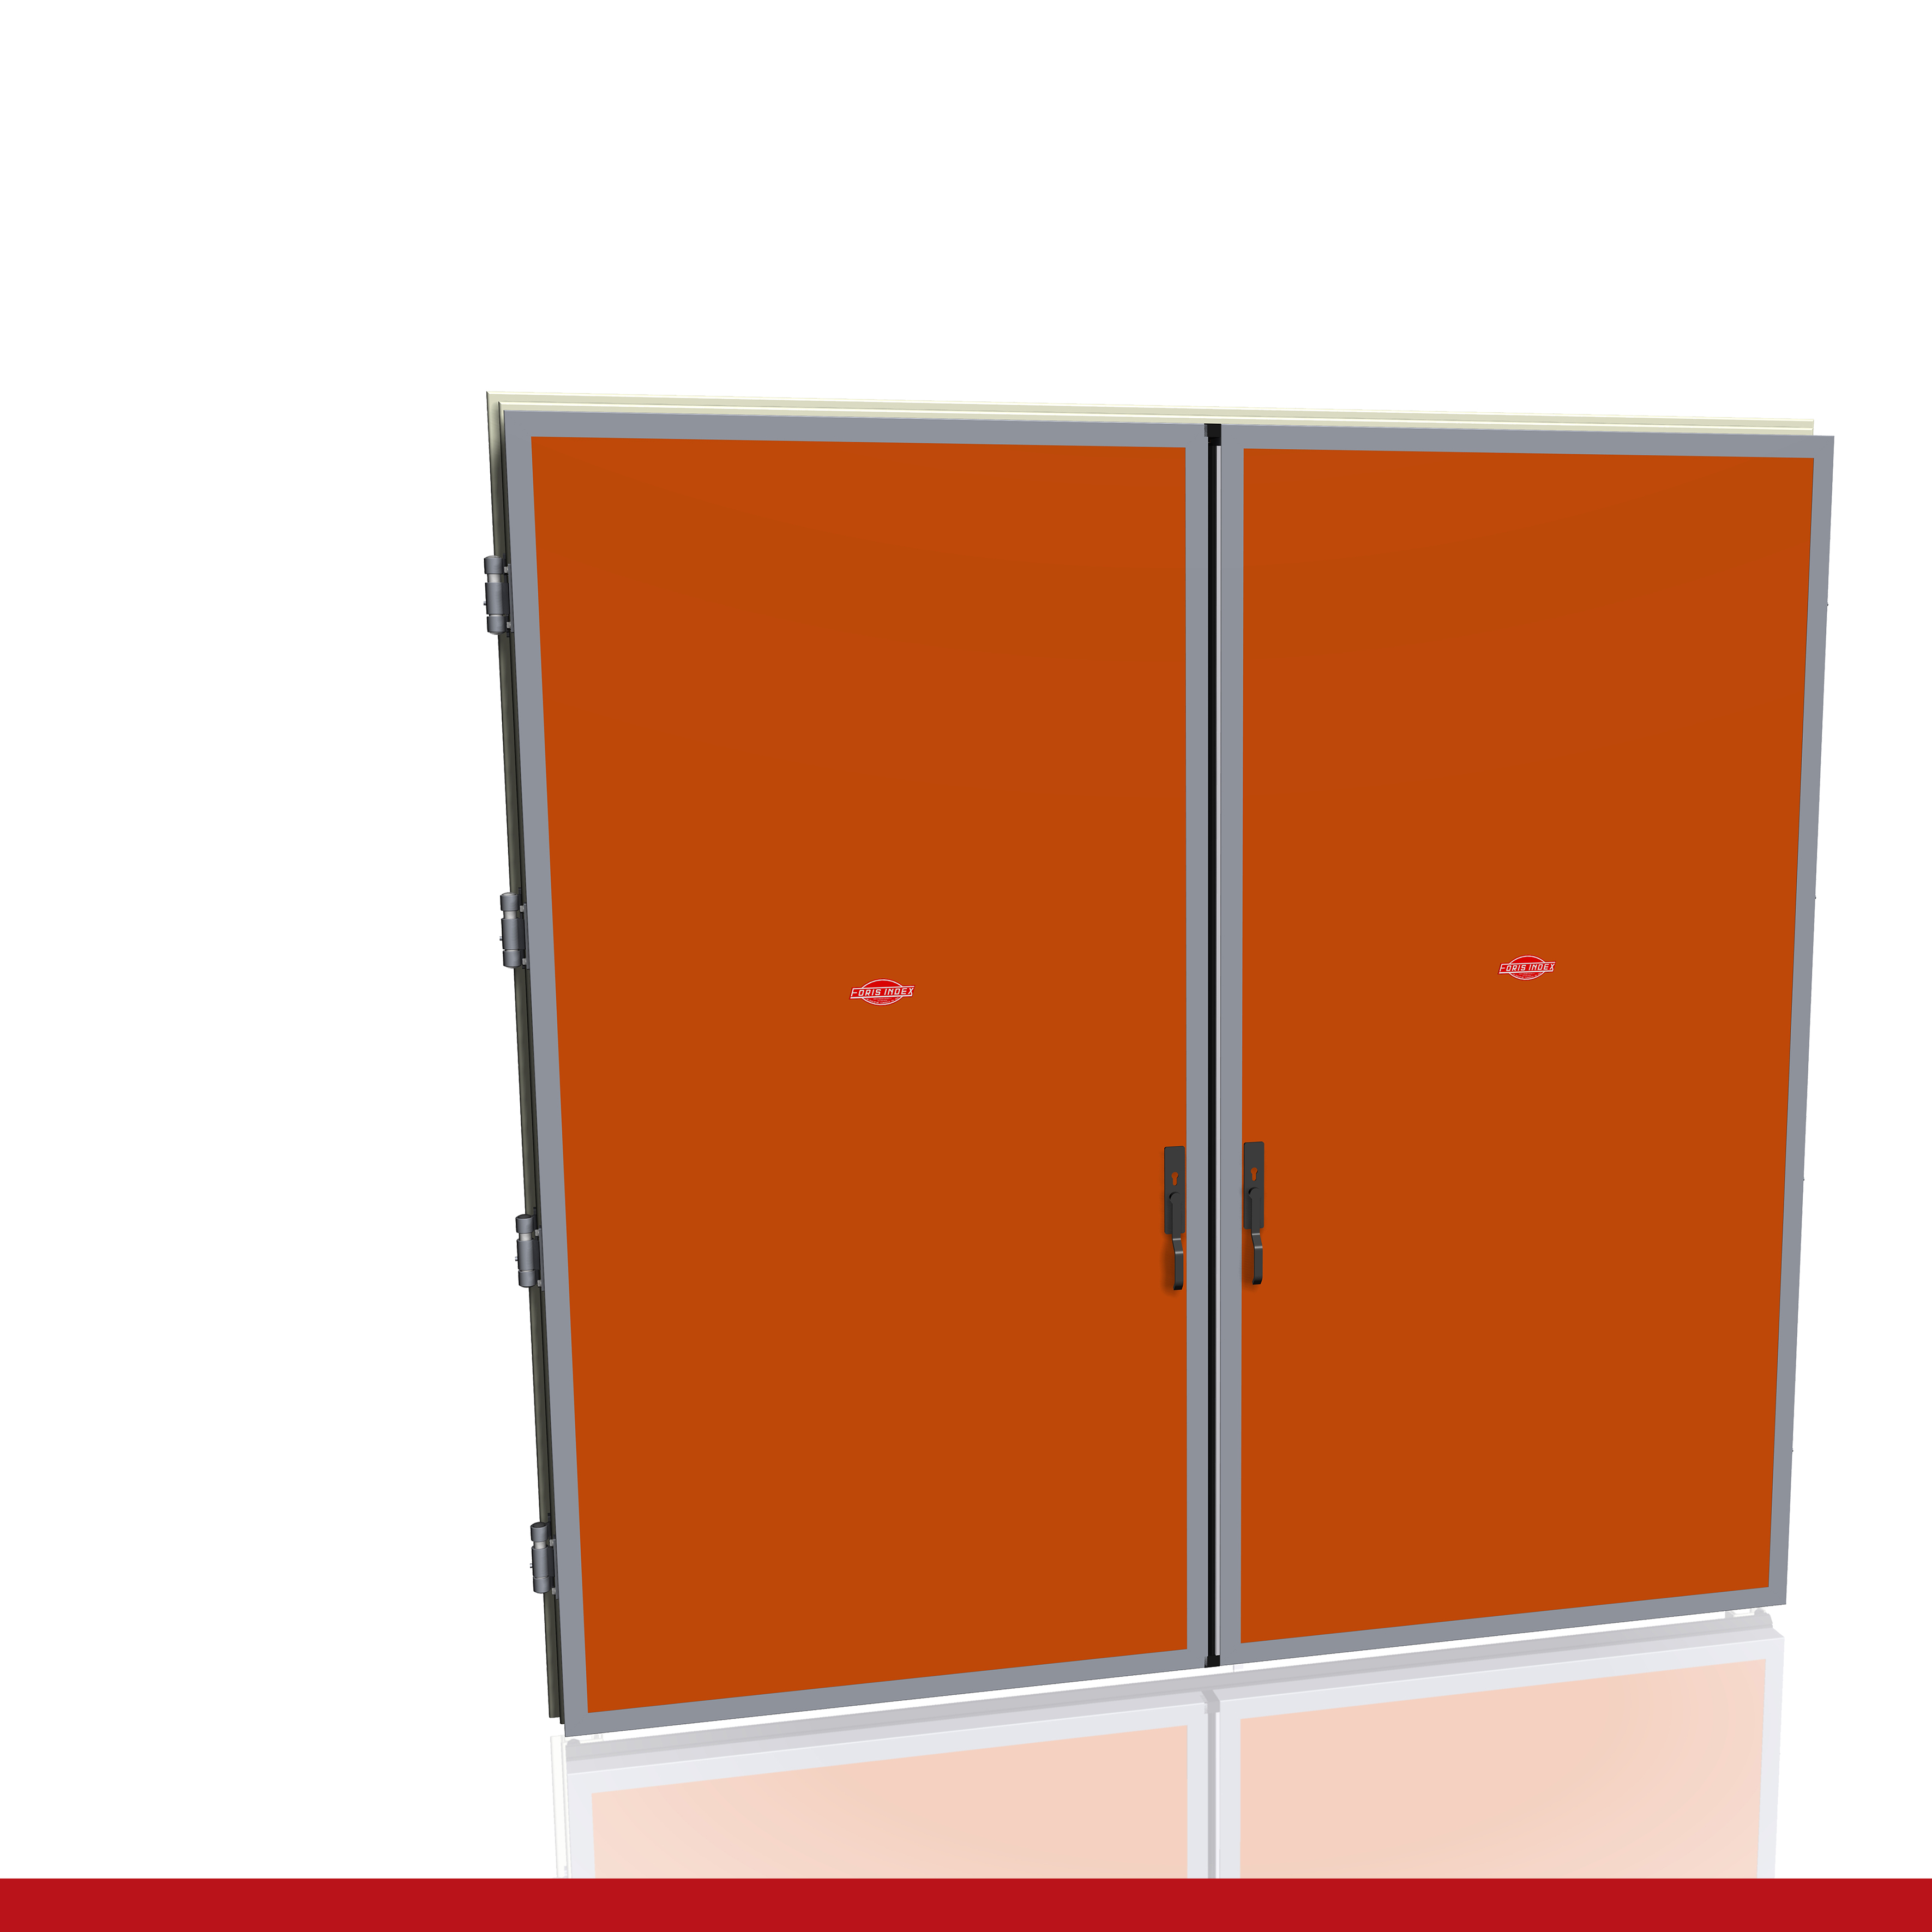 Porte Industriali - Maniglia standard - Due ante   Foris Index